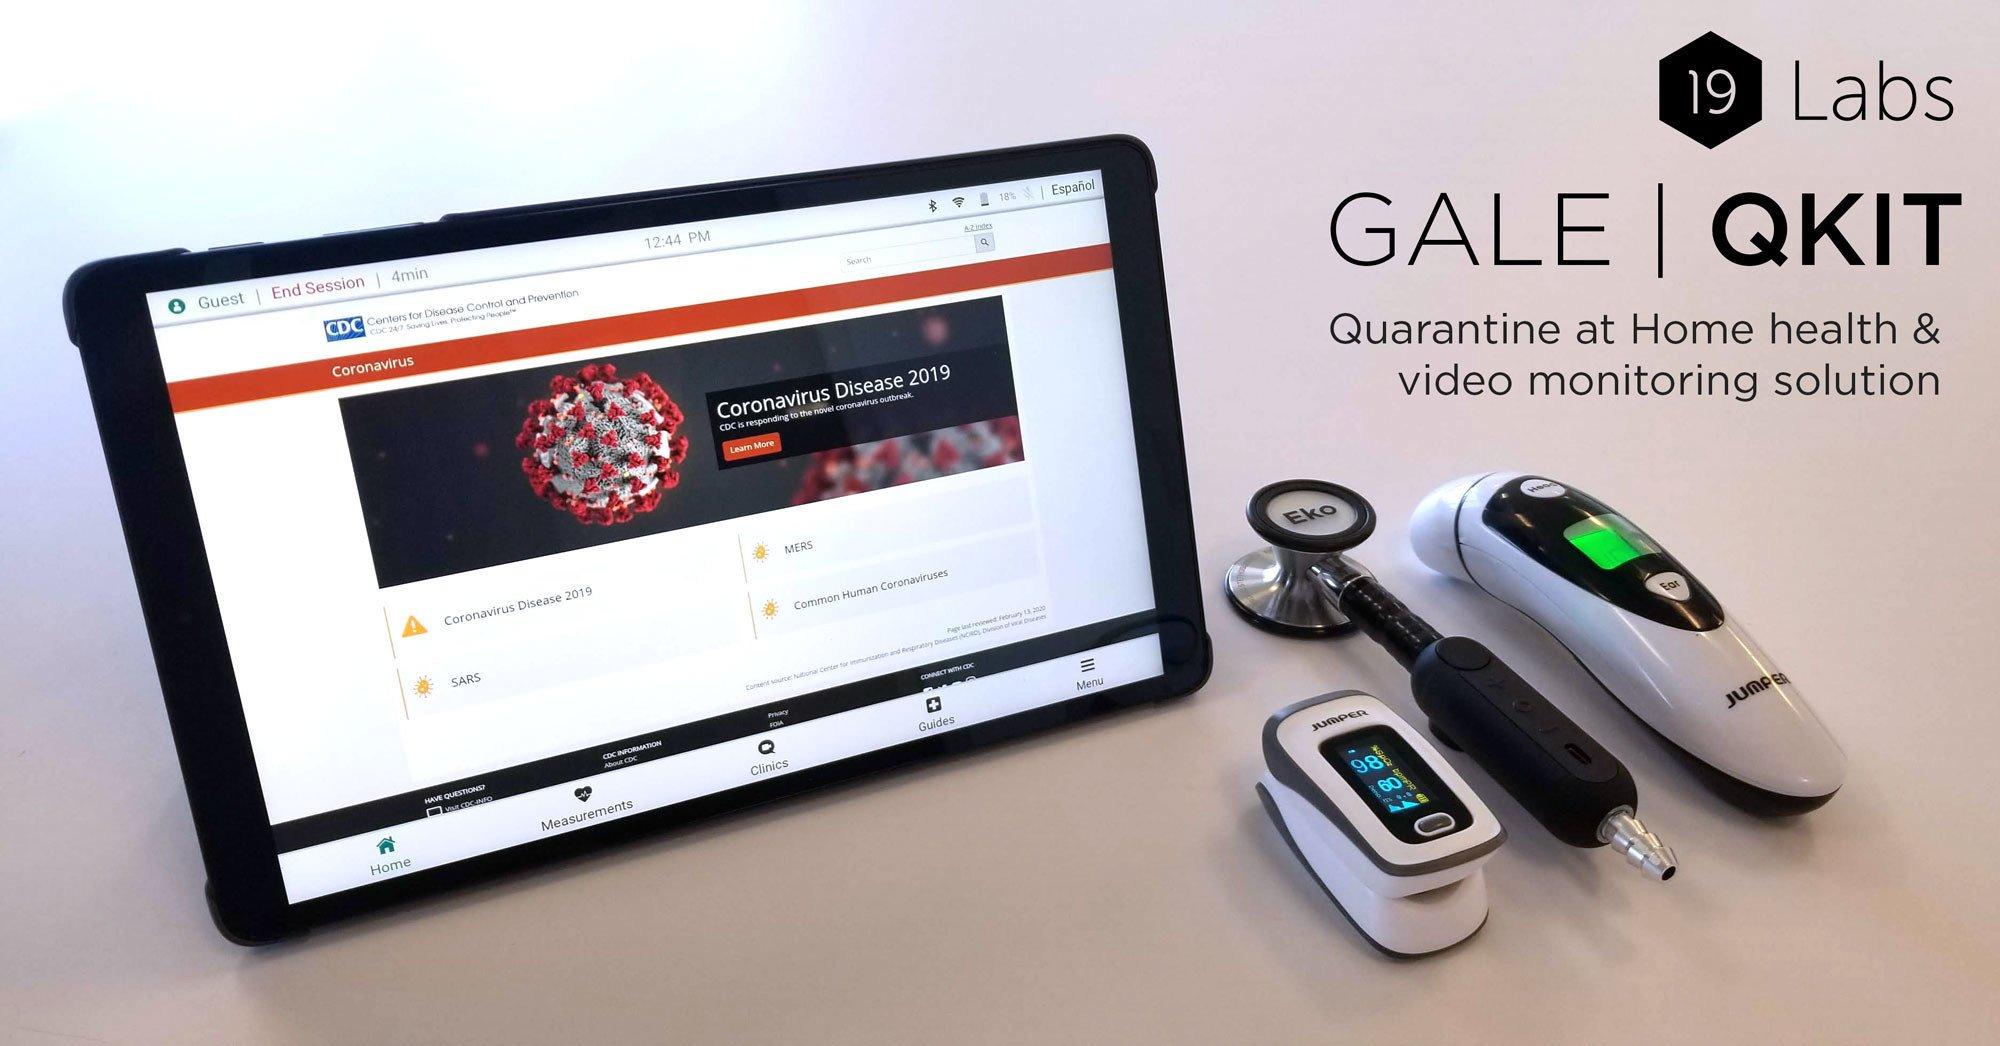 19 Labs – Quarantine monitoring & Telehealth solution